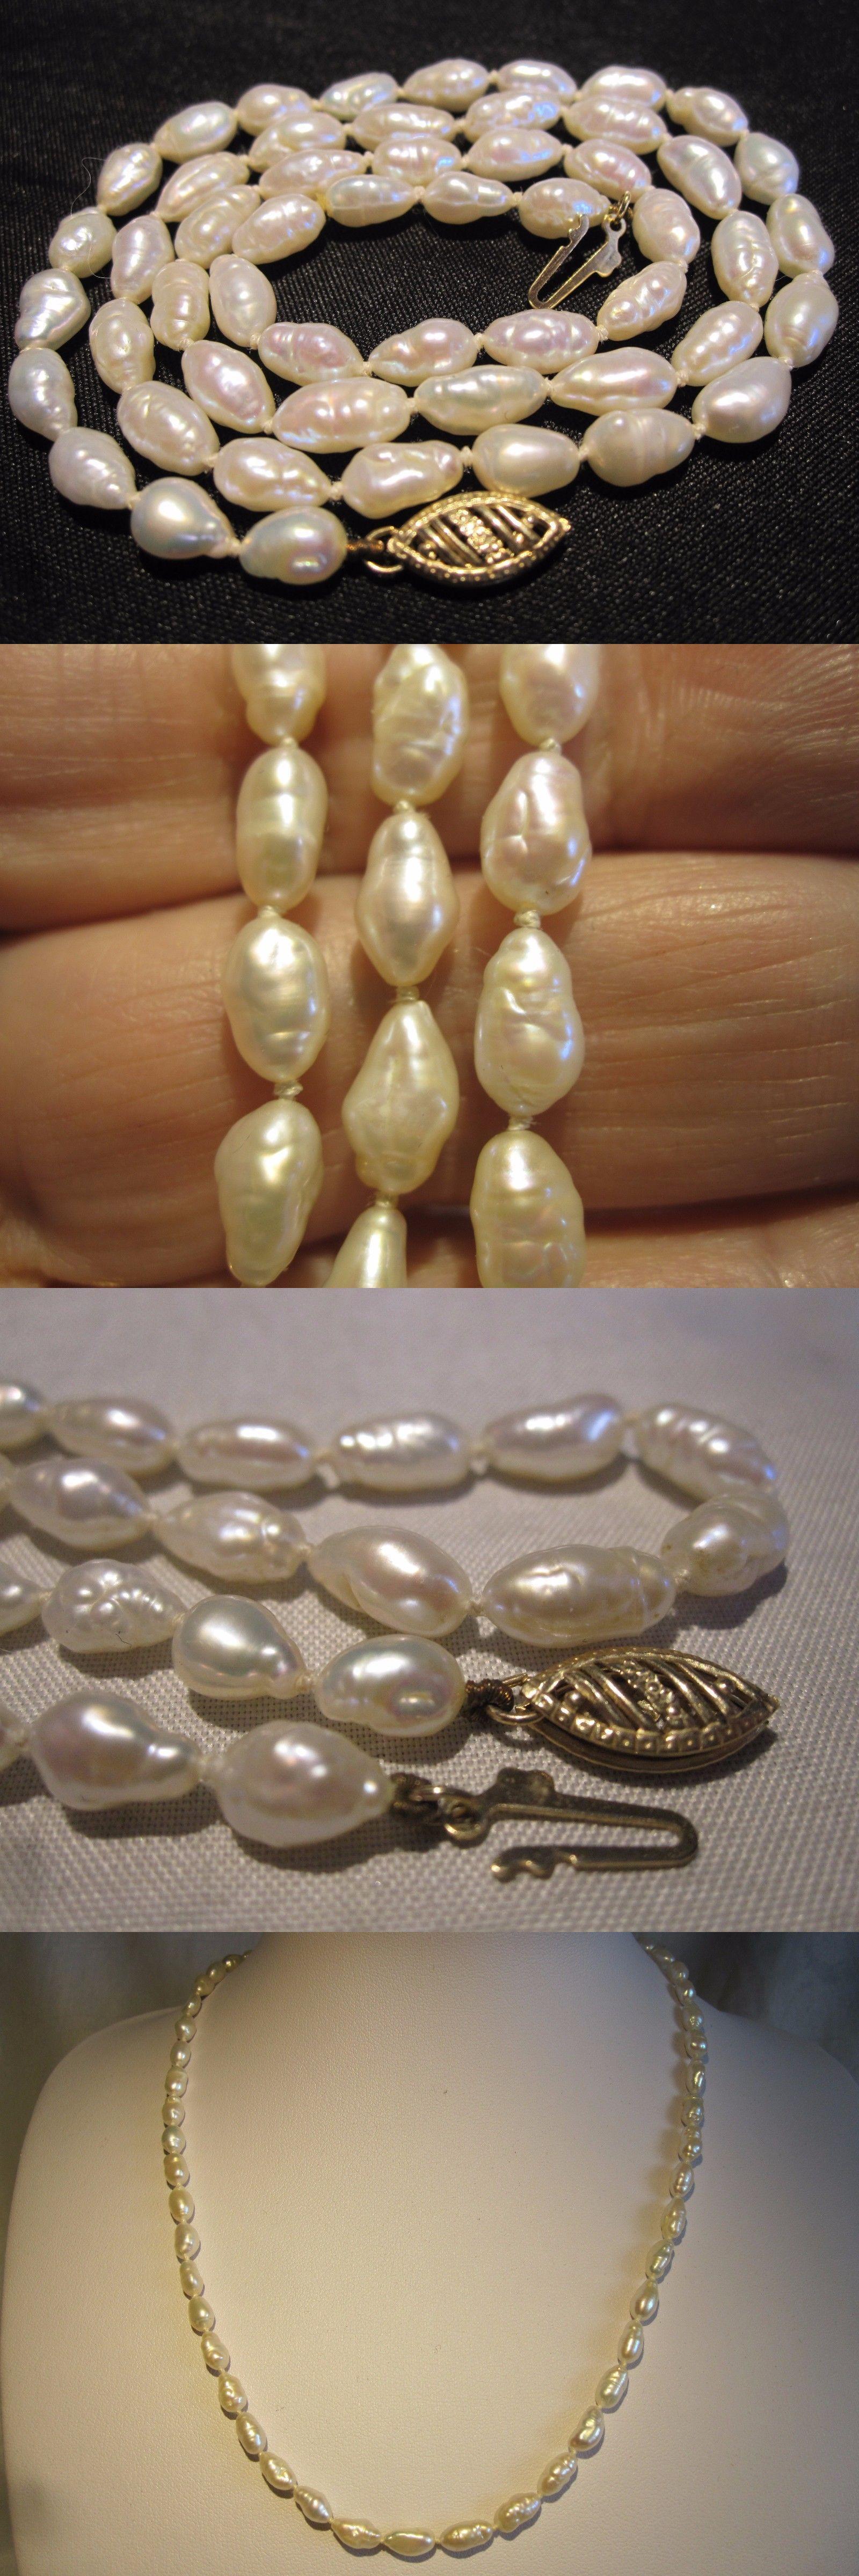 aqua gel beads vase filler of 30 pearl vase fillers the weekly world regarding pearl elegant vtg 14k gold genuine big baroque white 9 5 mm